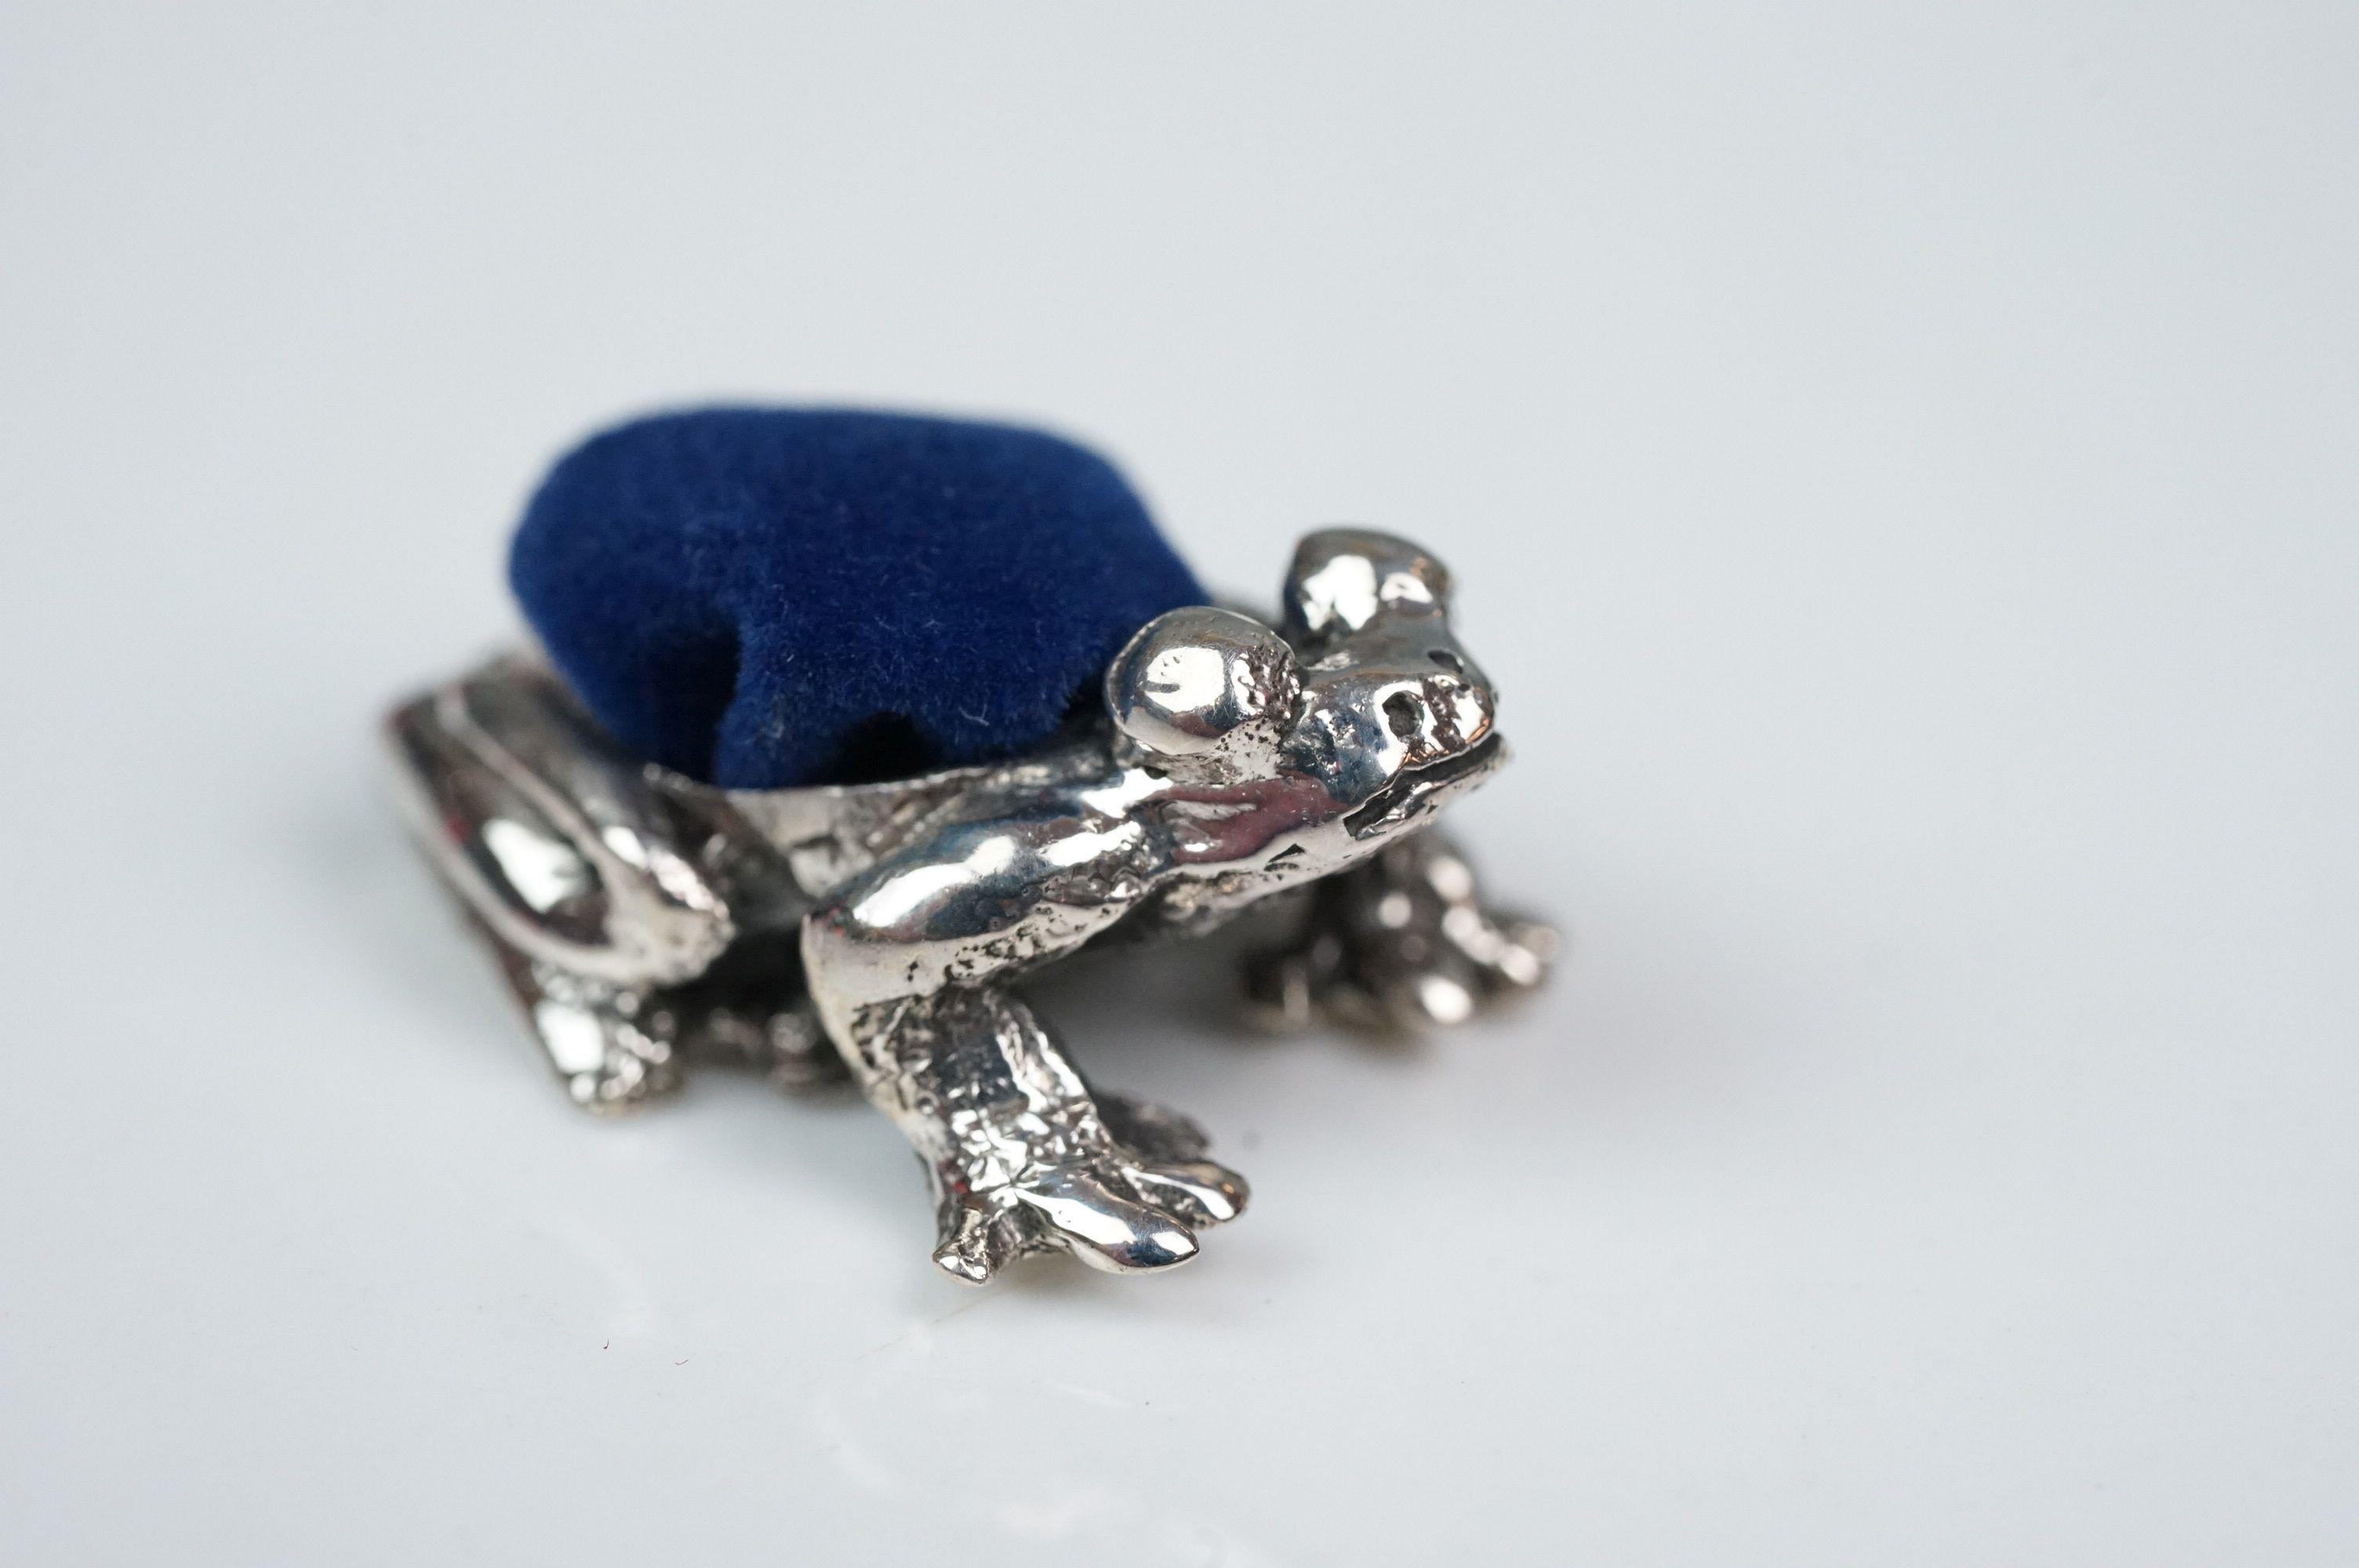 Silver frog pincushion - Image 4 of 4